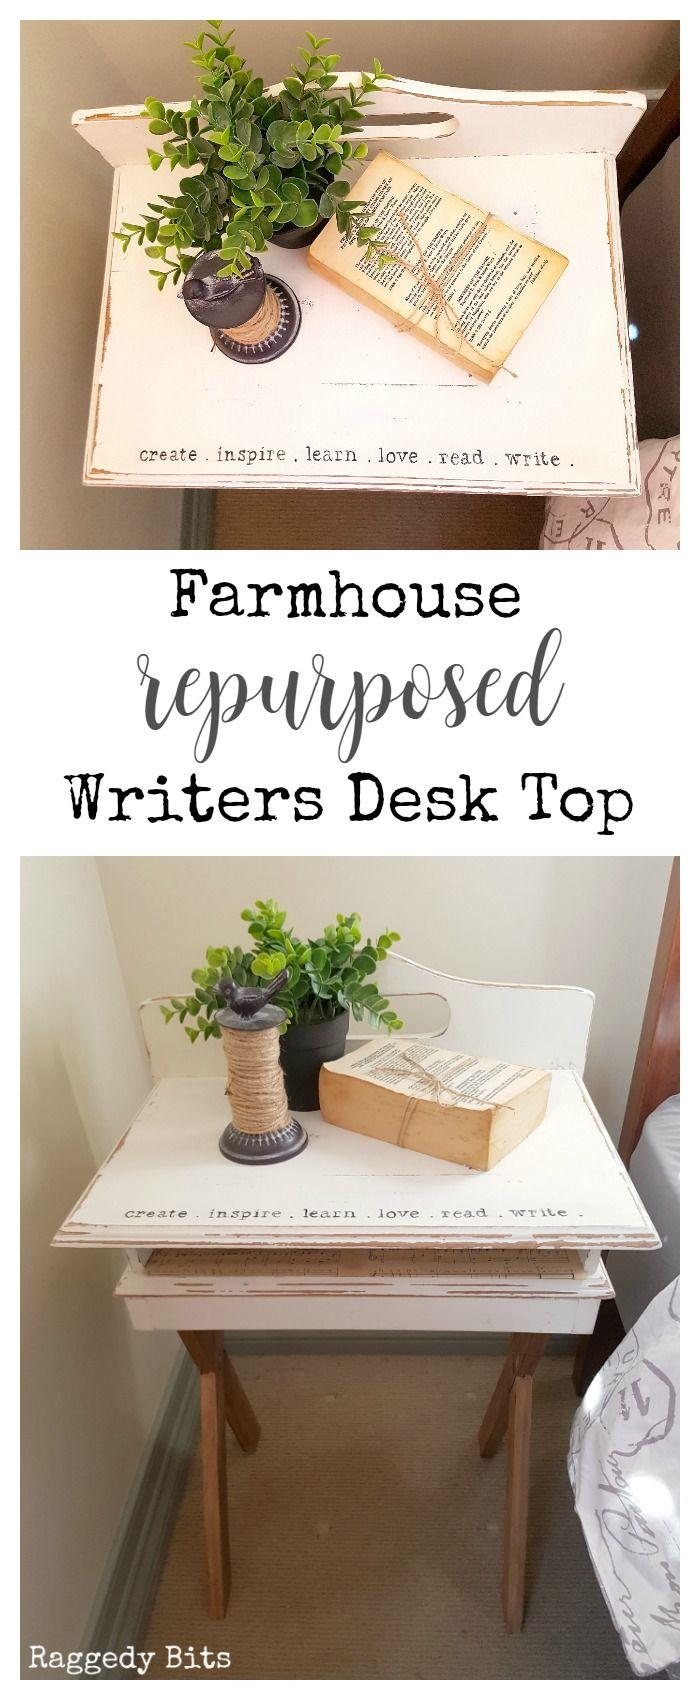 Farmhouse Repurposed Broken Writers Desk Top